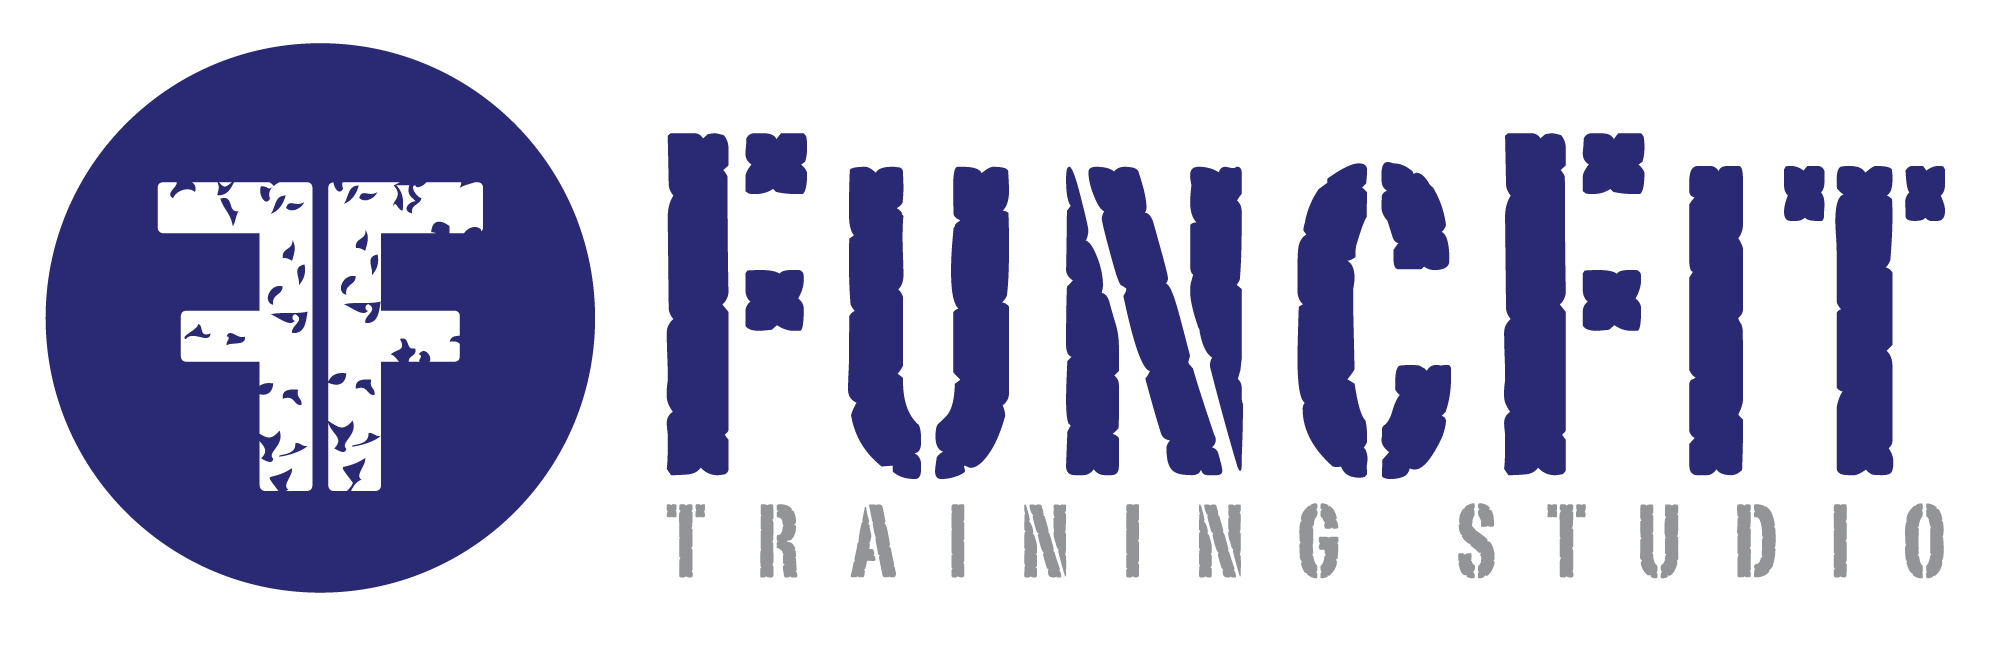 FFTS-2018-FC-Horz-Logo.png